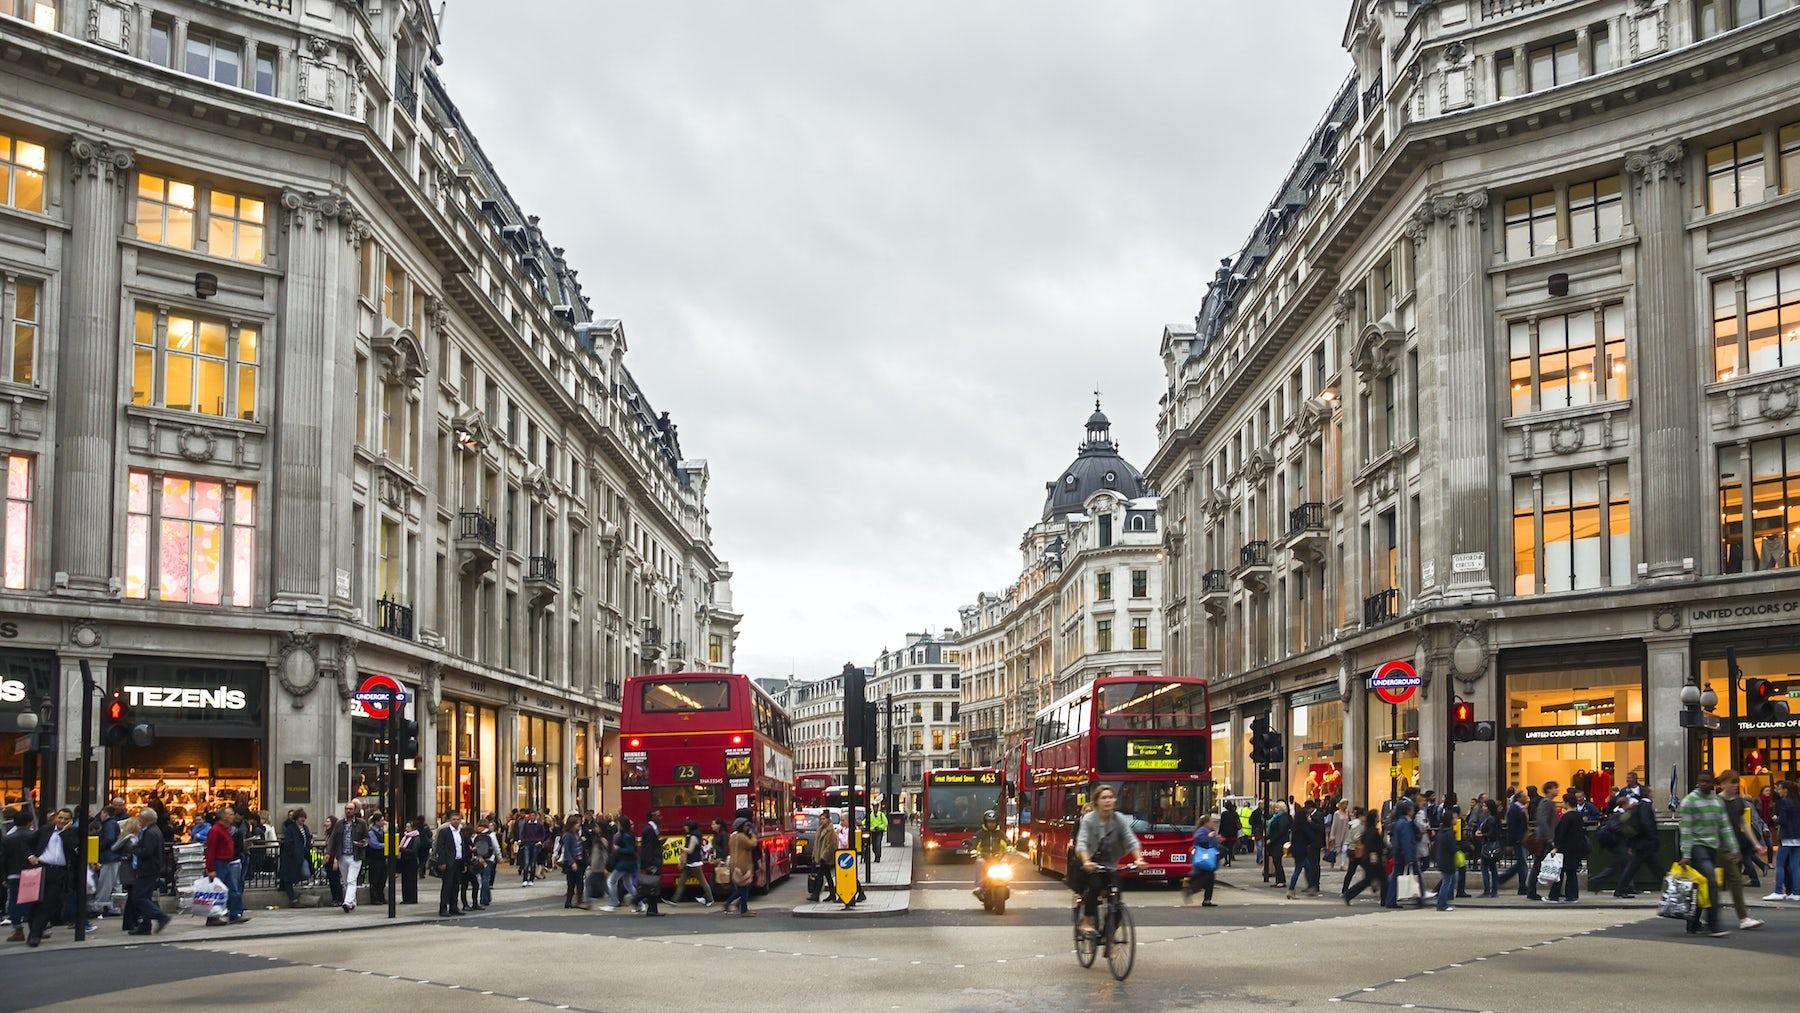 Oxford Circus London   Source: Shutterstock